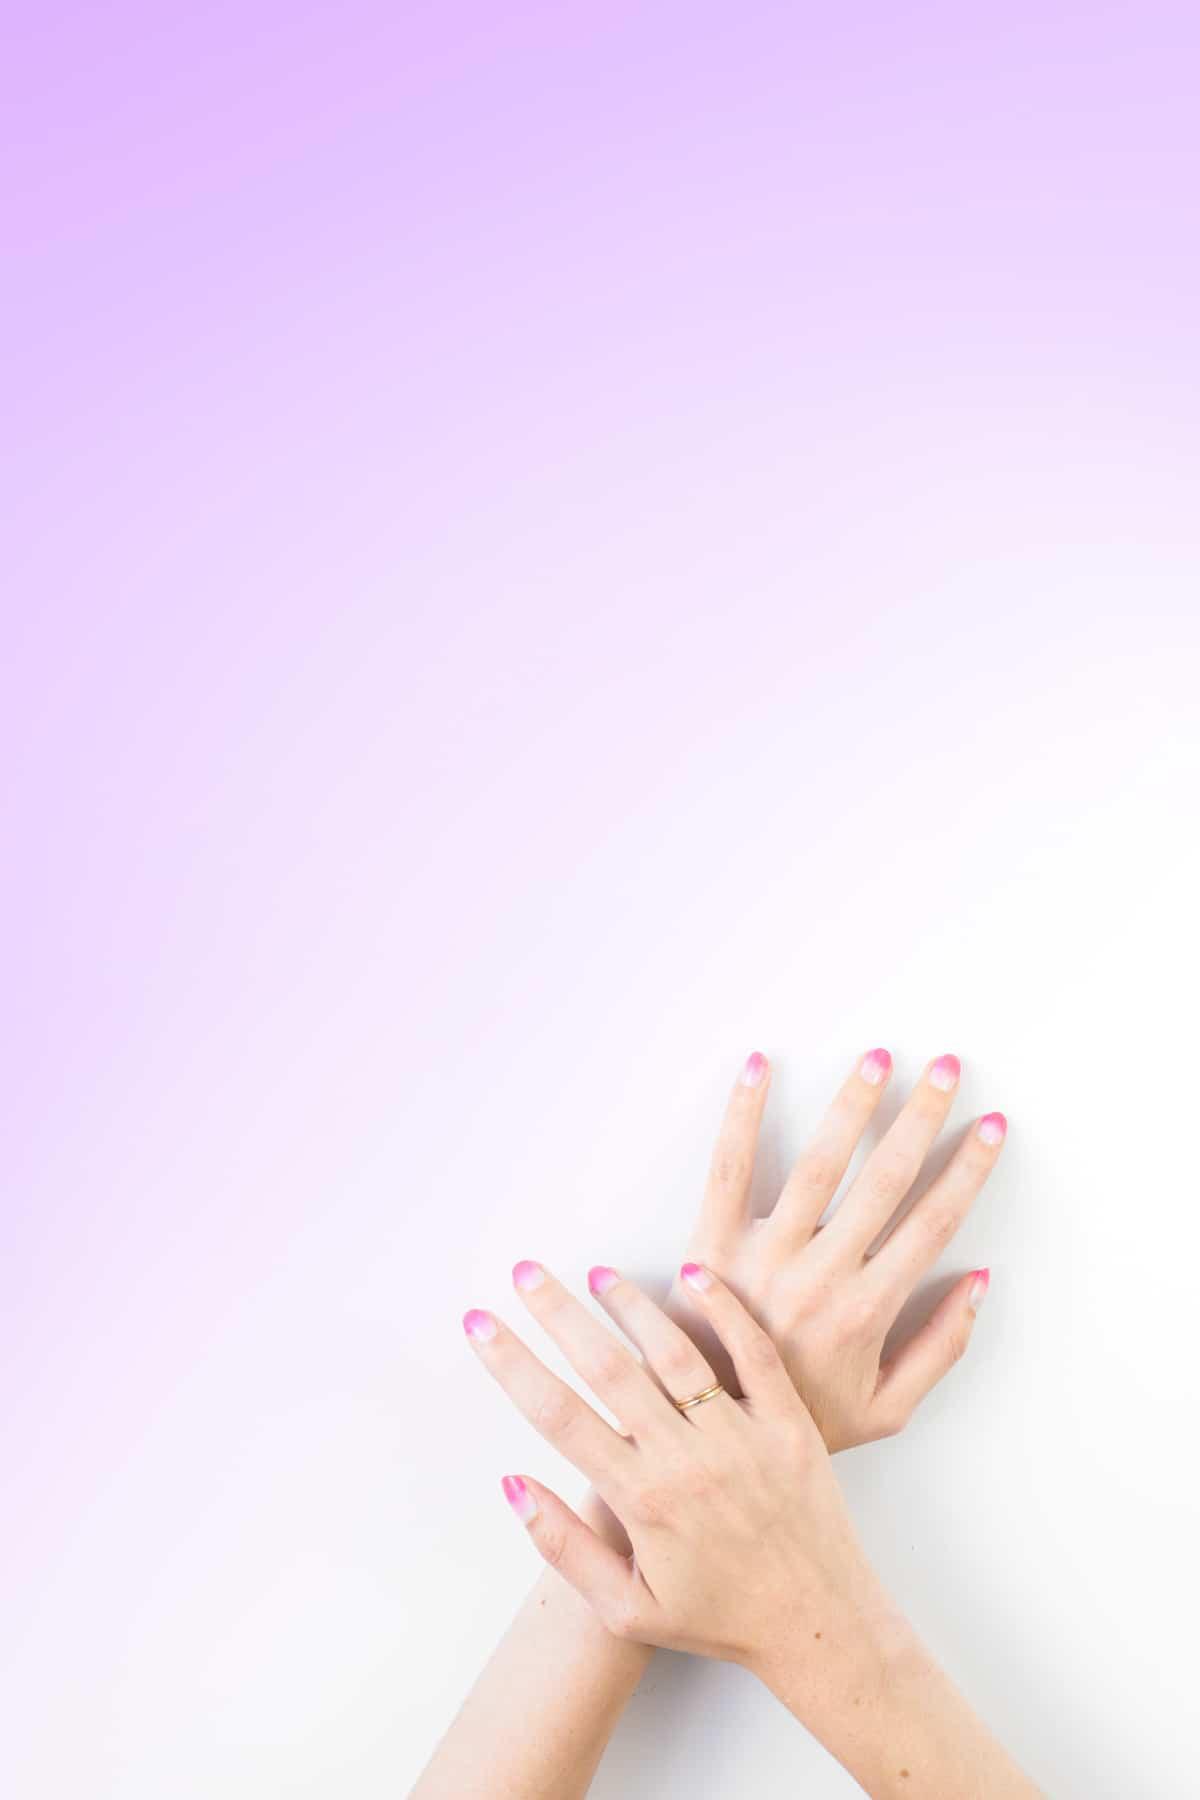 Makeup Sponge Nails by Studio DIY | 6 Easy Nail Ideas